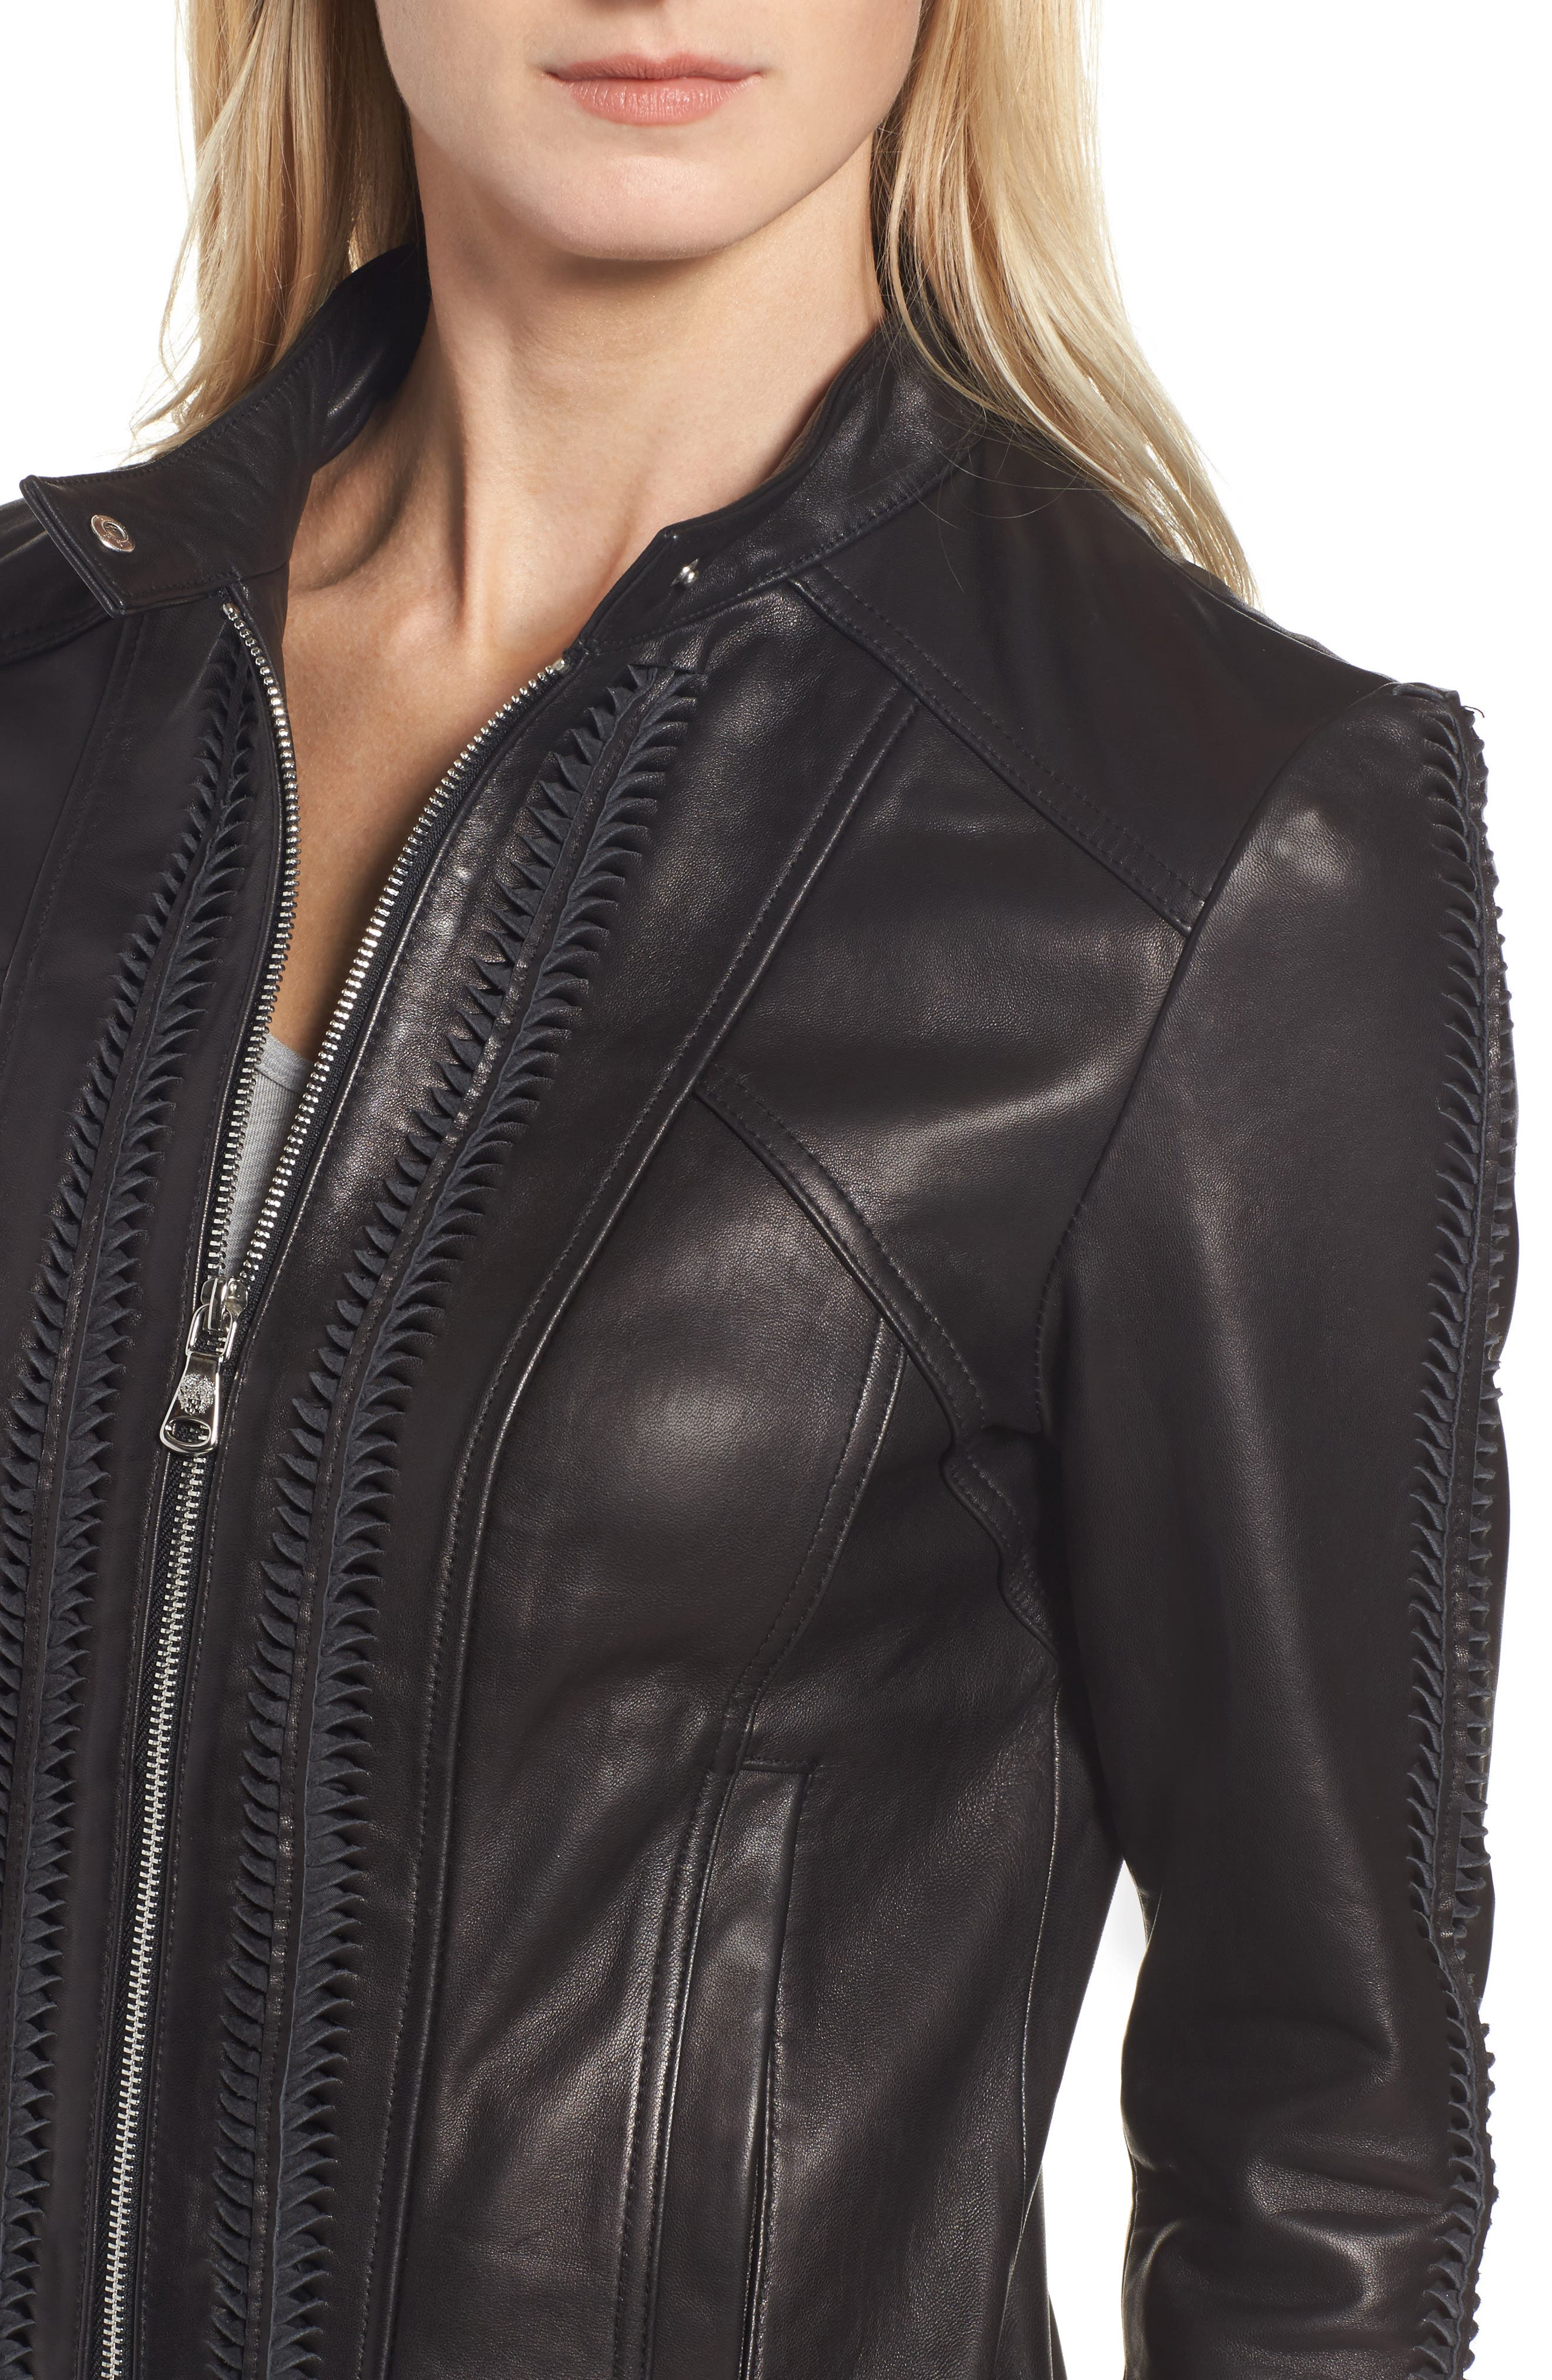 Braid Detail Leather Jacket,                             Alternate thumbnail 4, color,                             Black